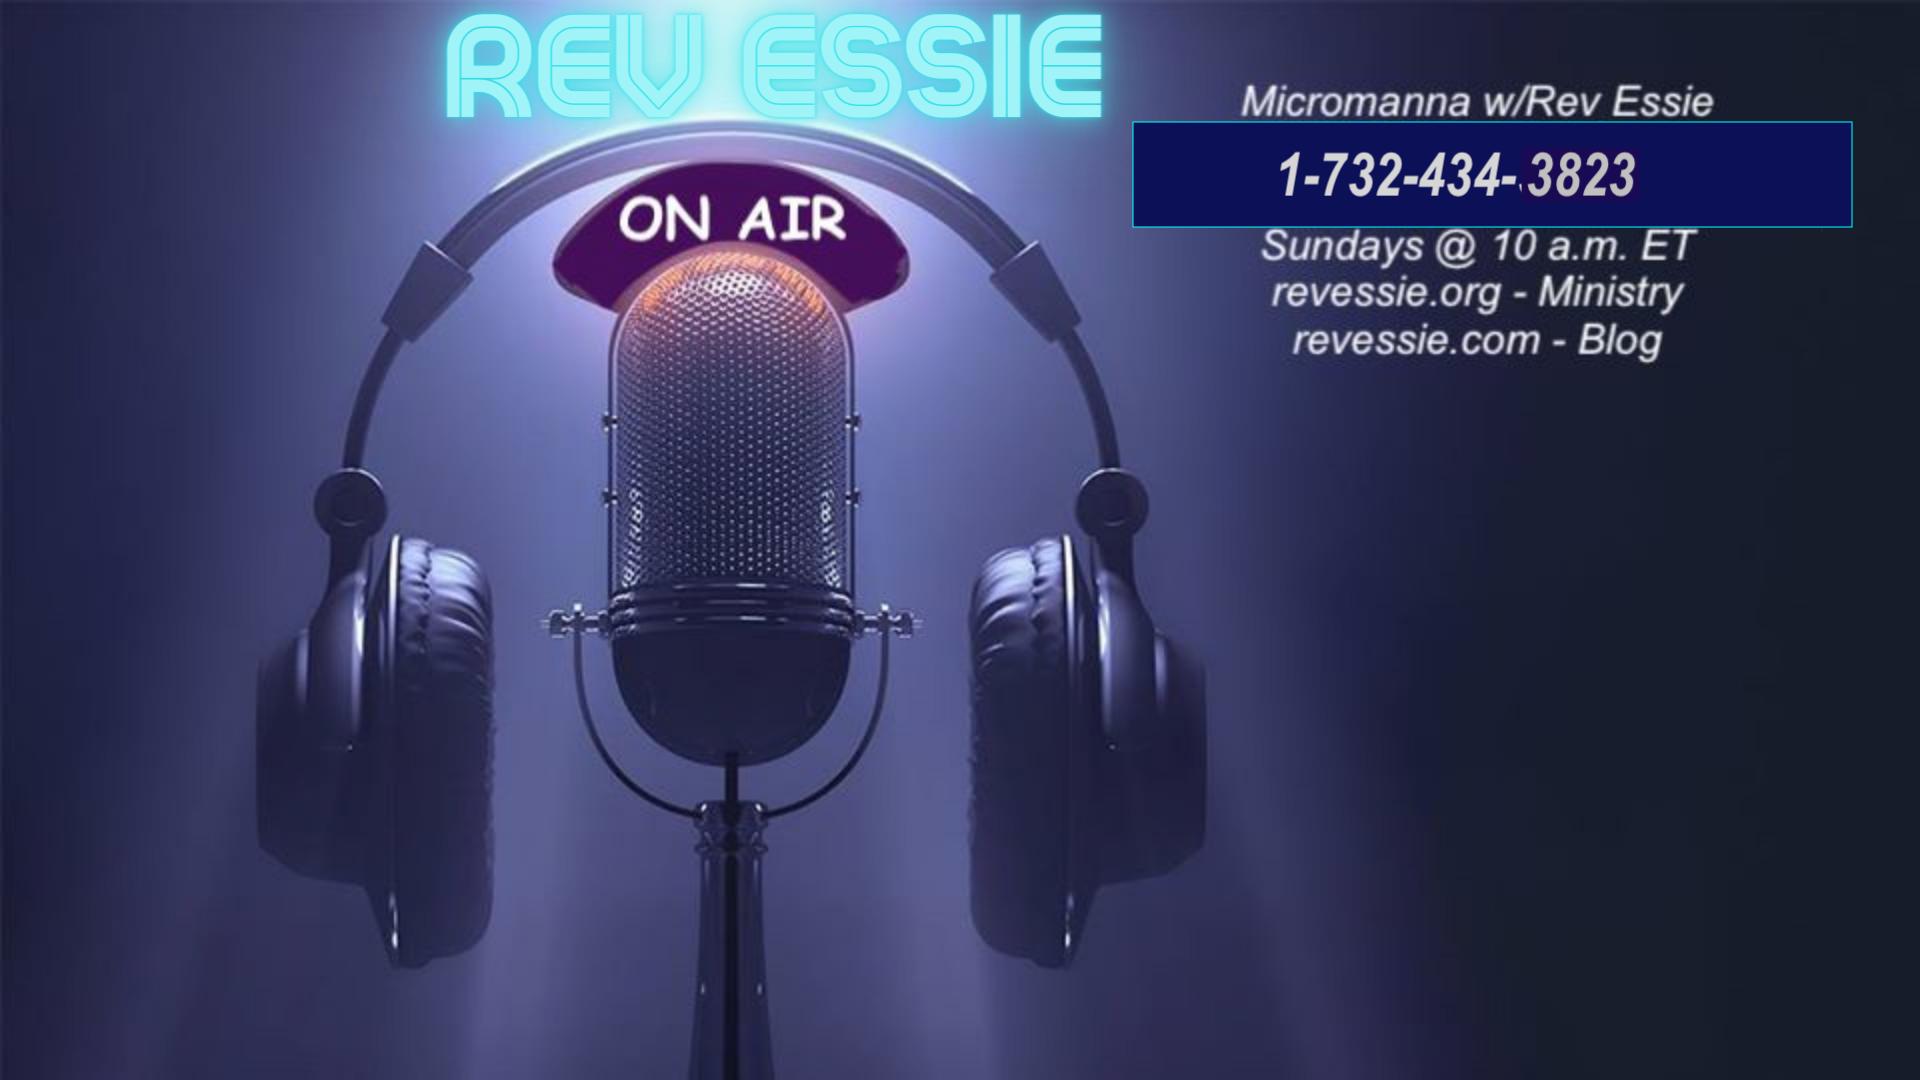 rev-essie-on-air-100921-2